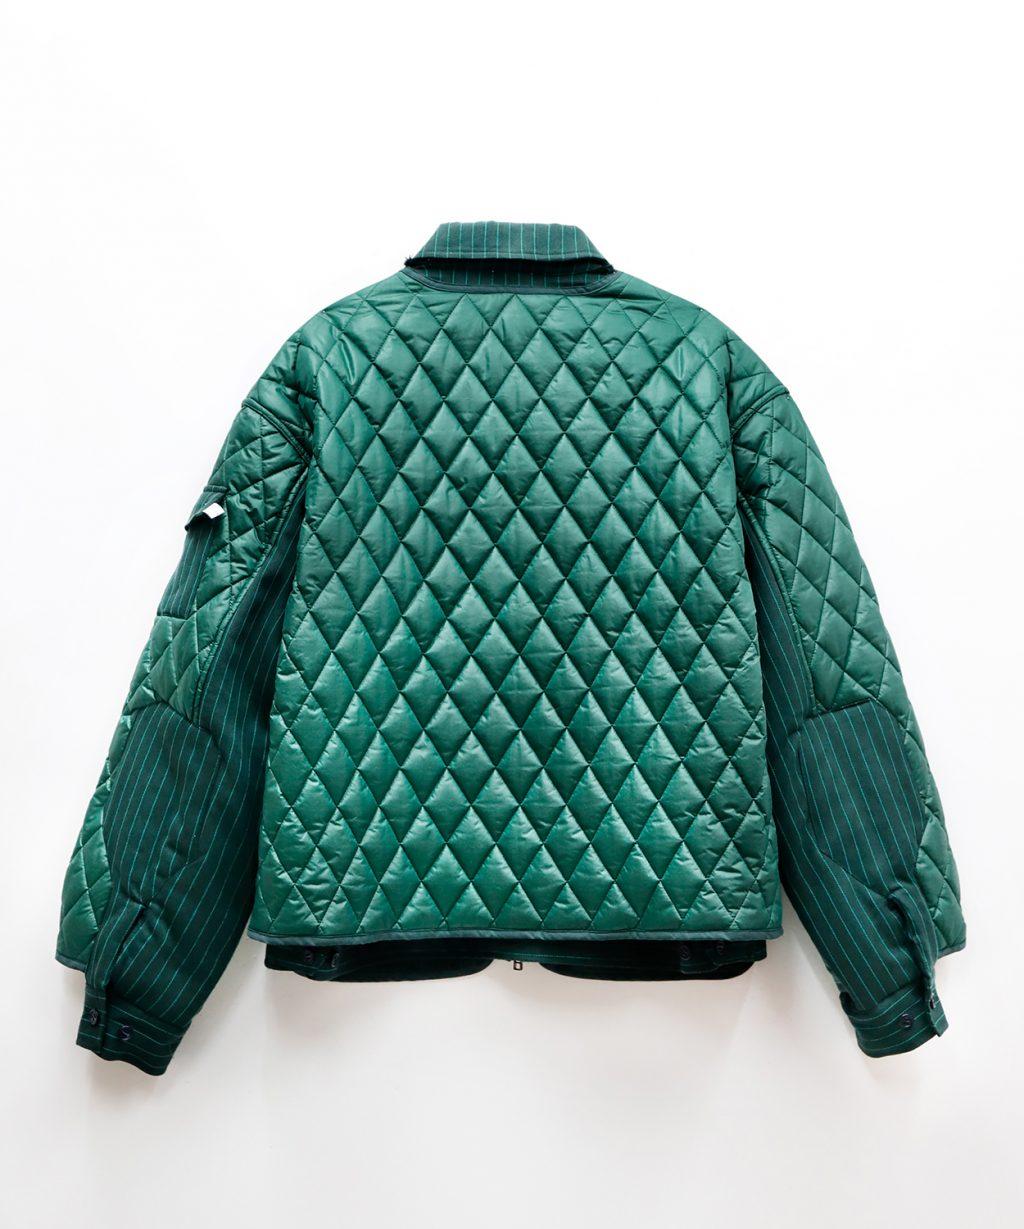 FACE-COCA-COLA-MIX-WORK-JACKET-green2-1024x1229.jpg